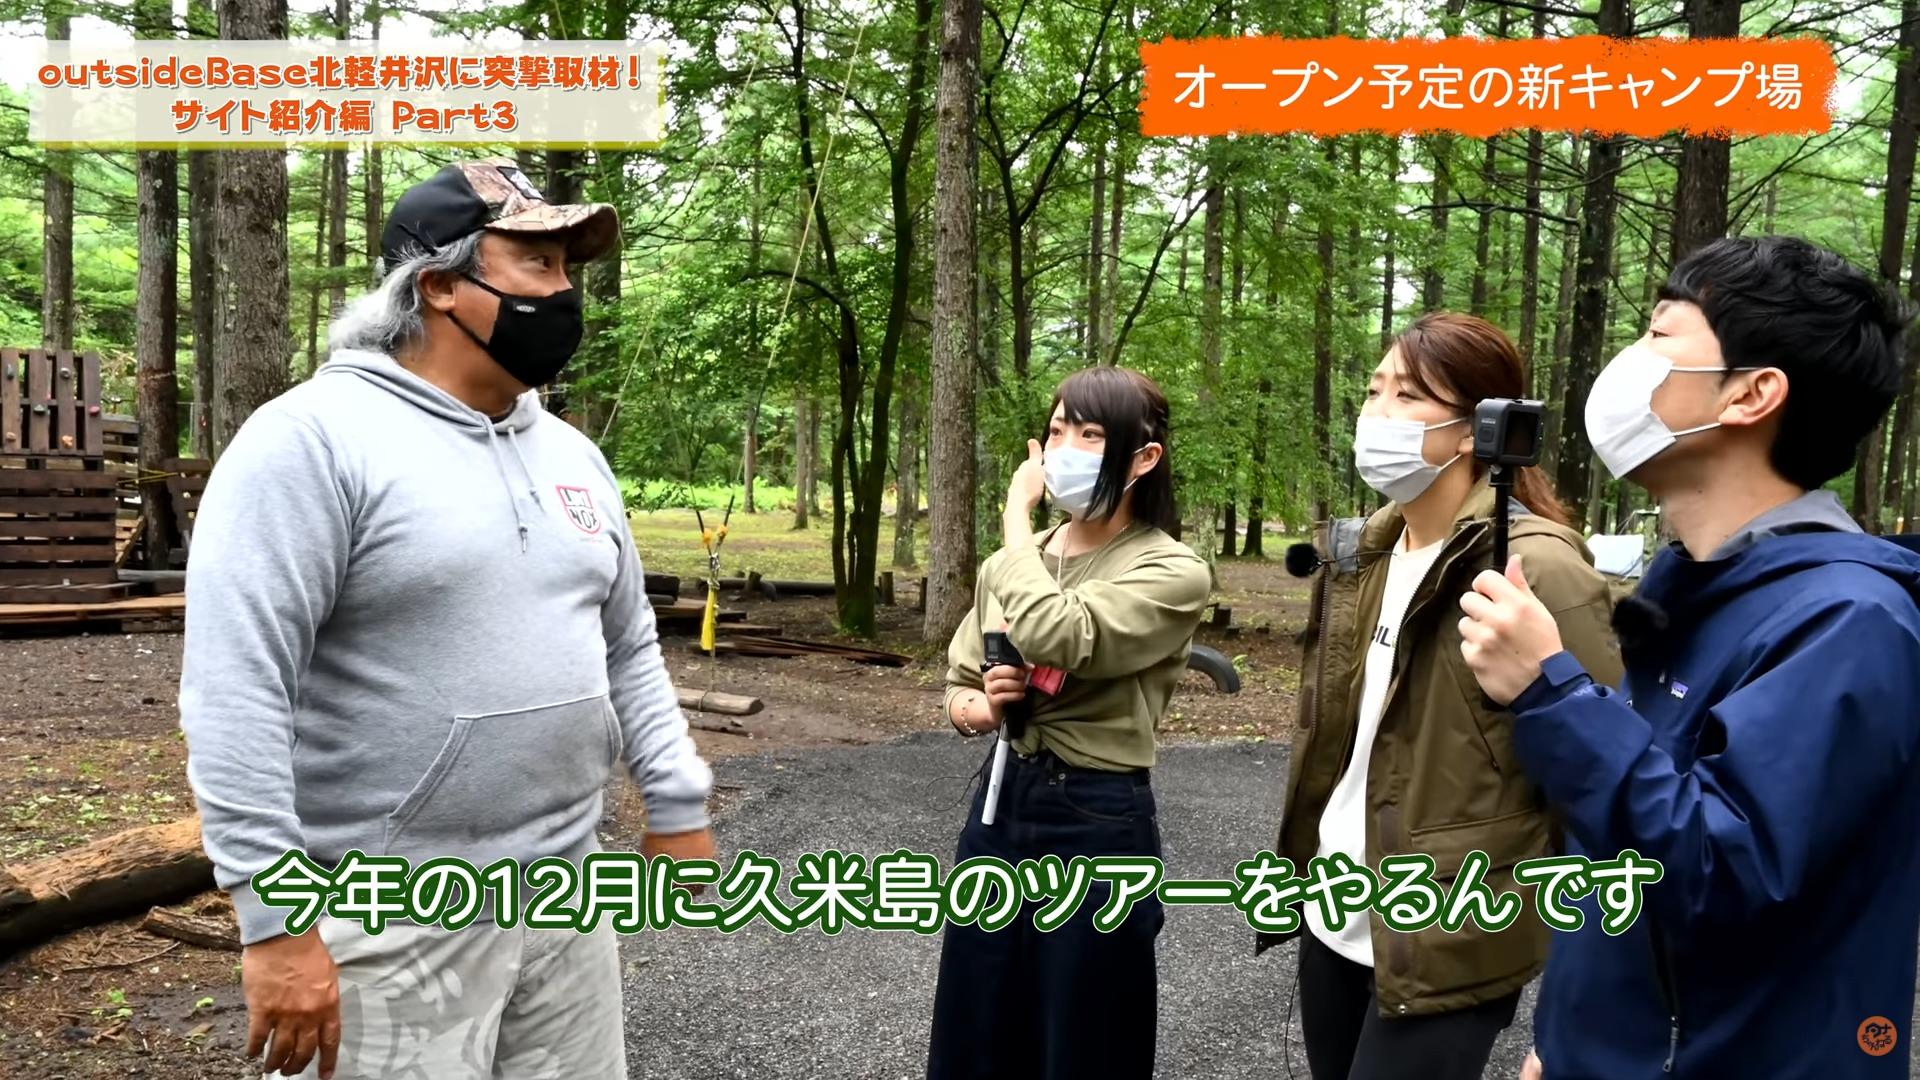 outsidebase北軽井沢 久米島ツアー